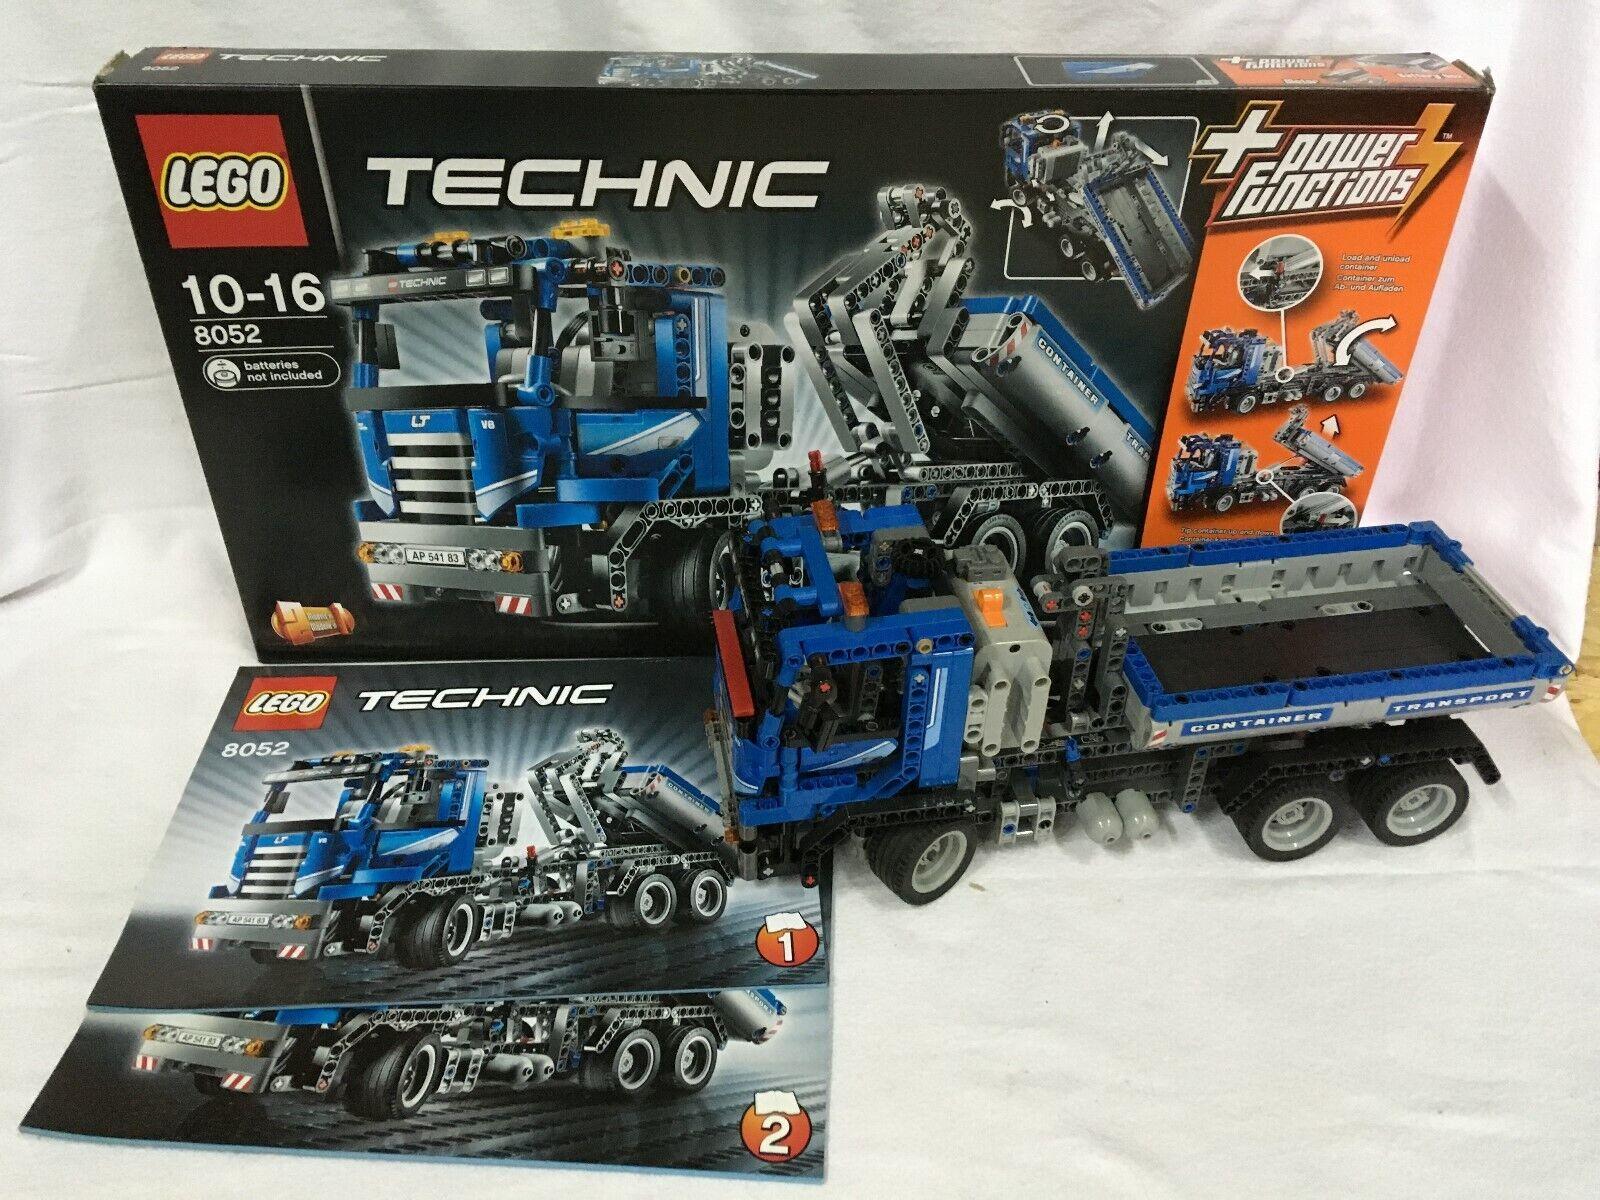 LEGO Technik Container-Truck (8052) mit Power Functions